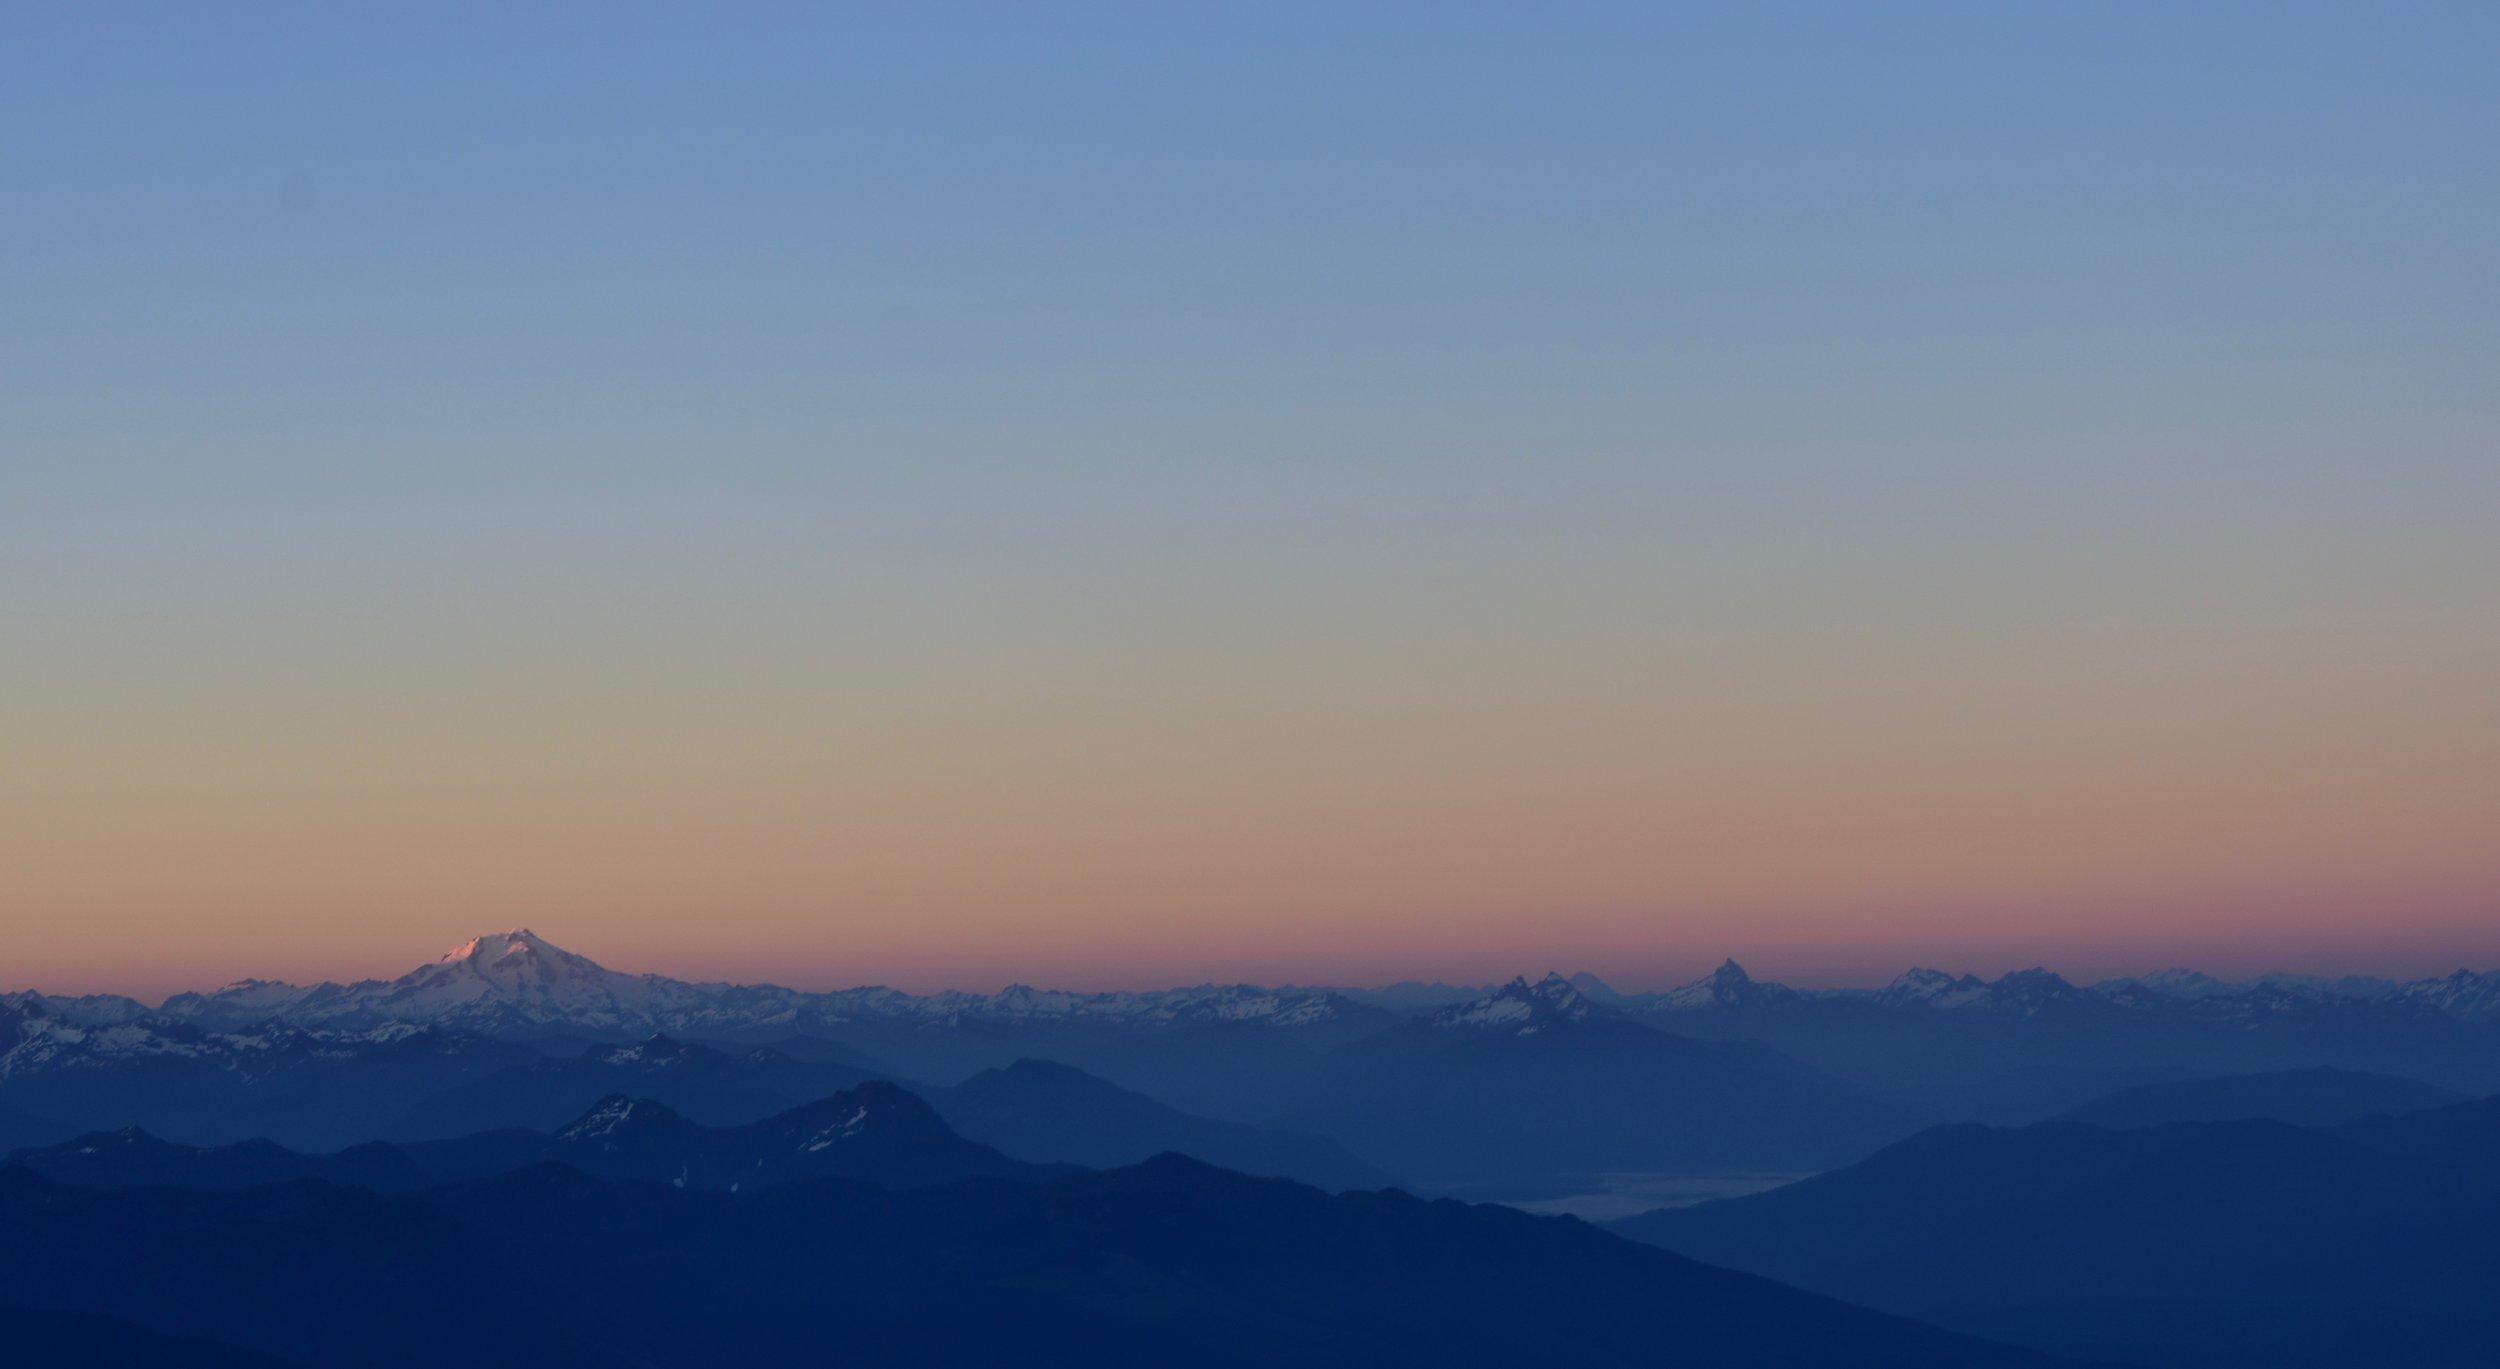 Alpineglow on Glacier Peak